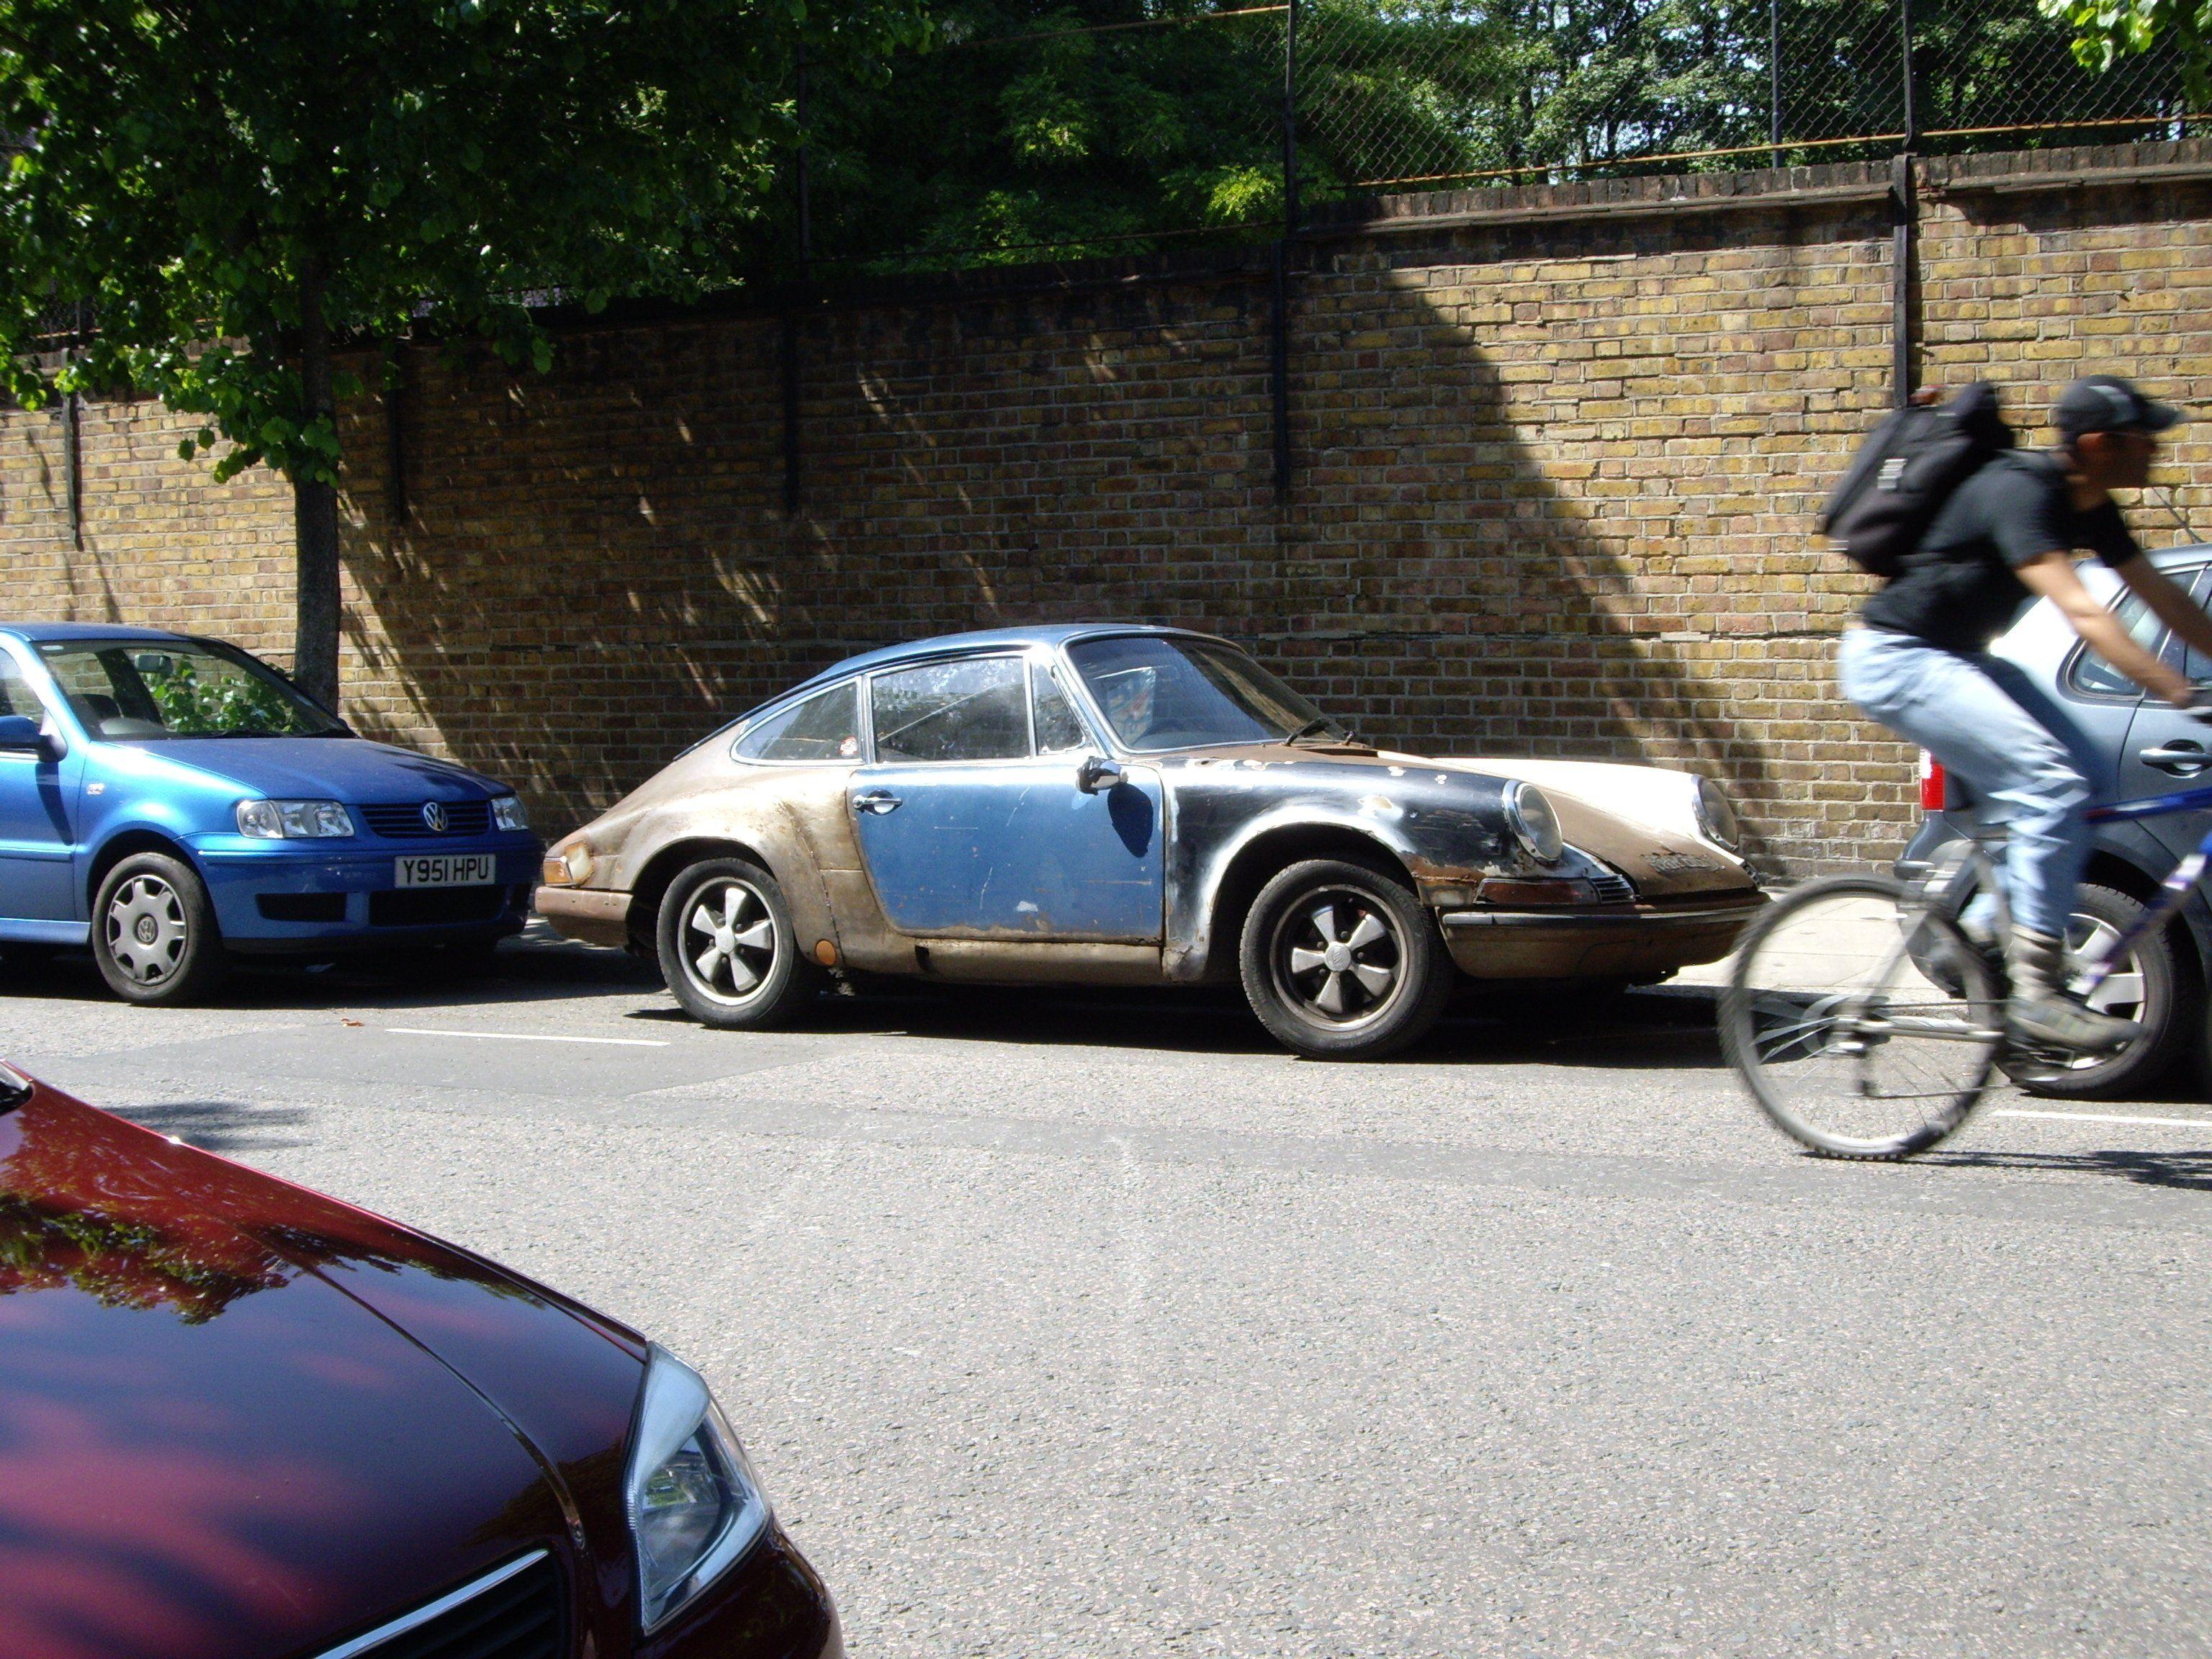 Porsche_911_rat_rod.jpg 3,072×2,304 pixels